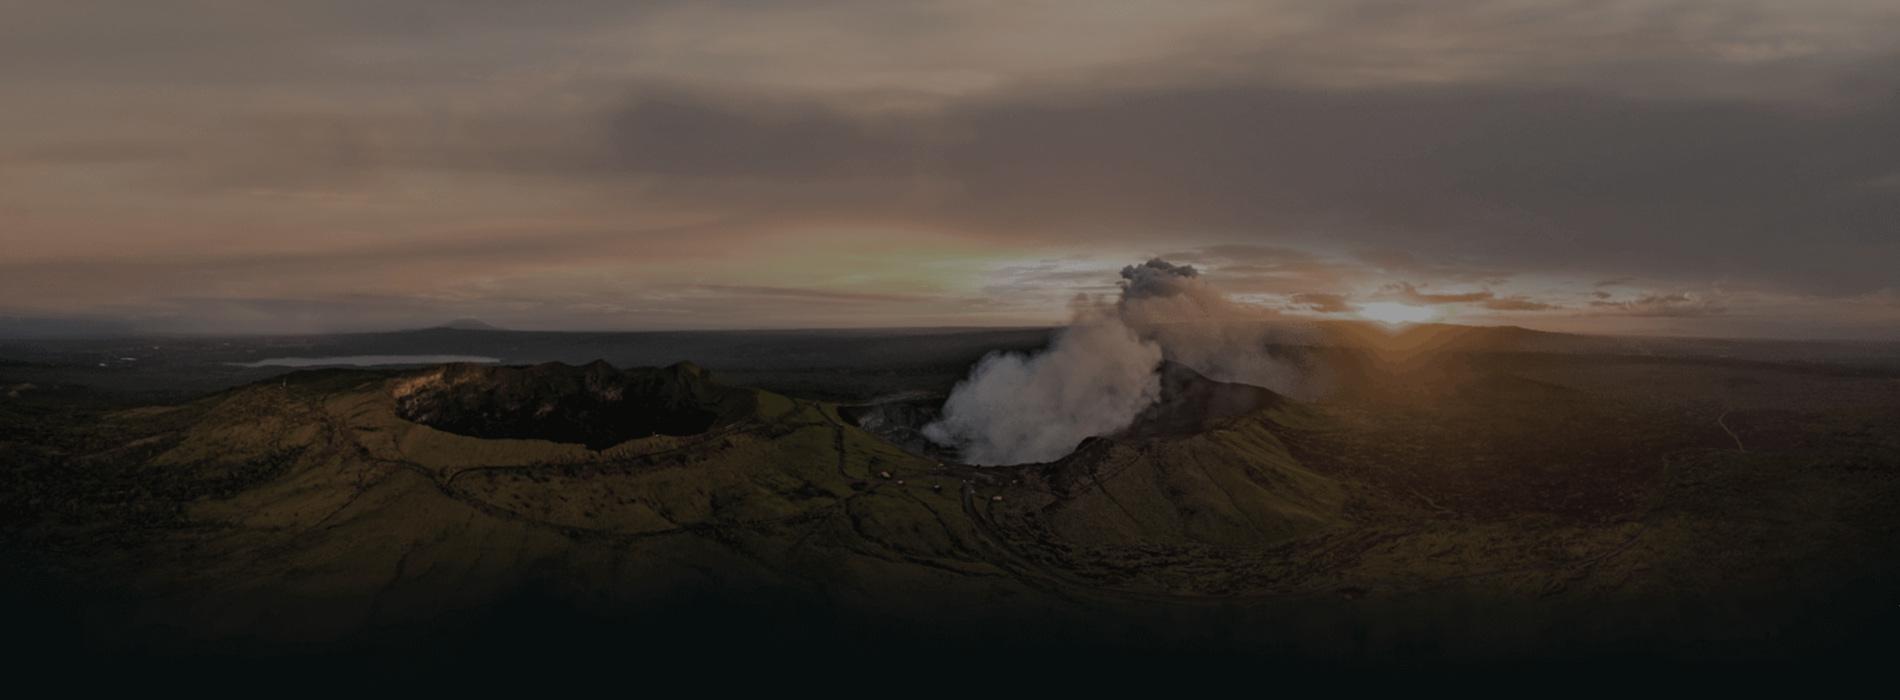 A Digital Volcano